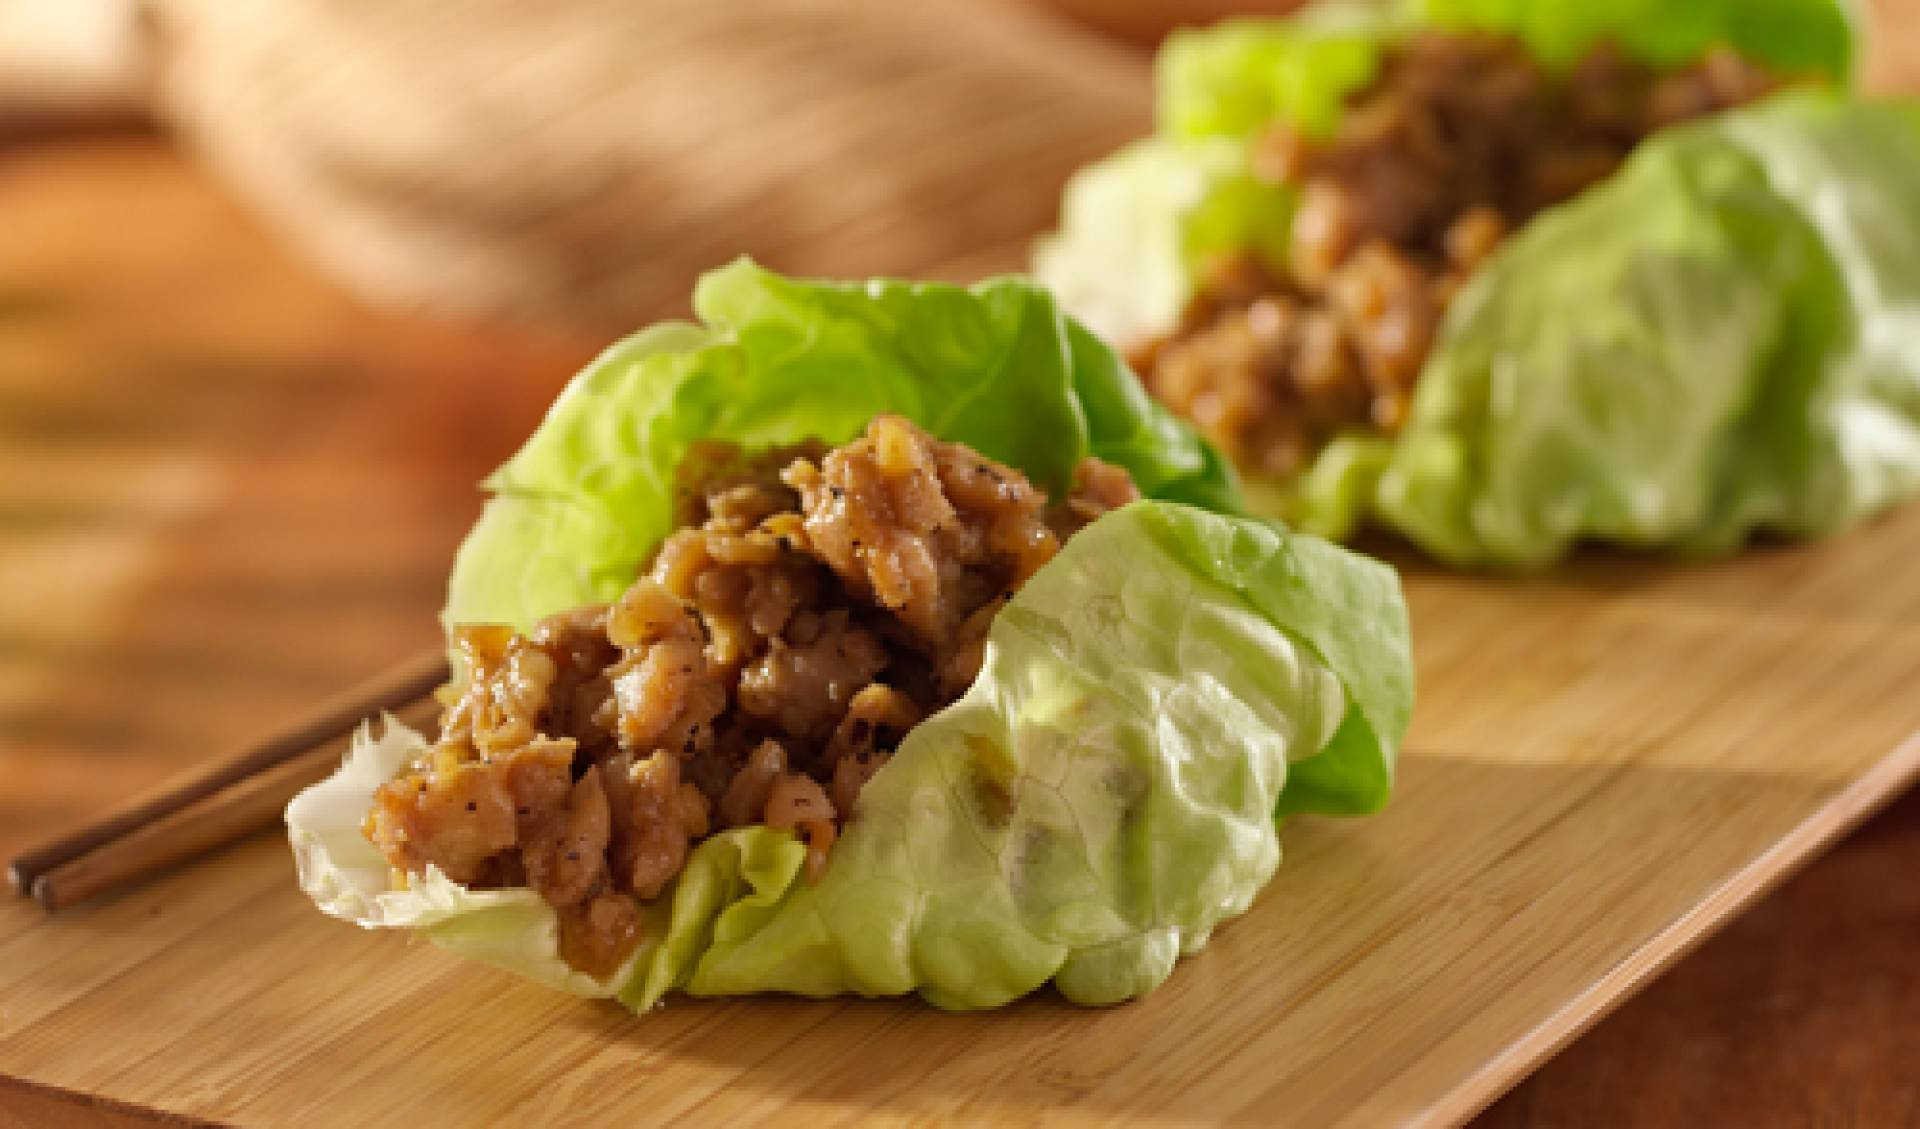 Chicken Caesar lettuce wraps